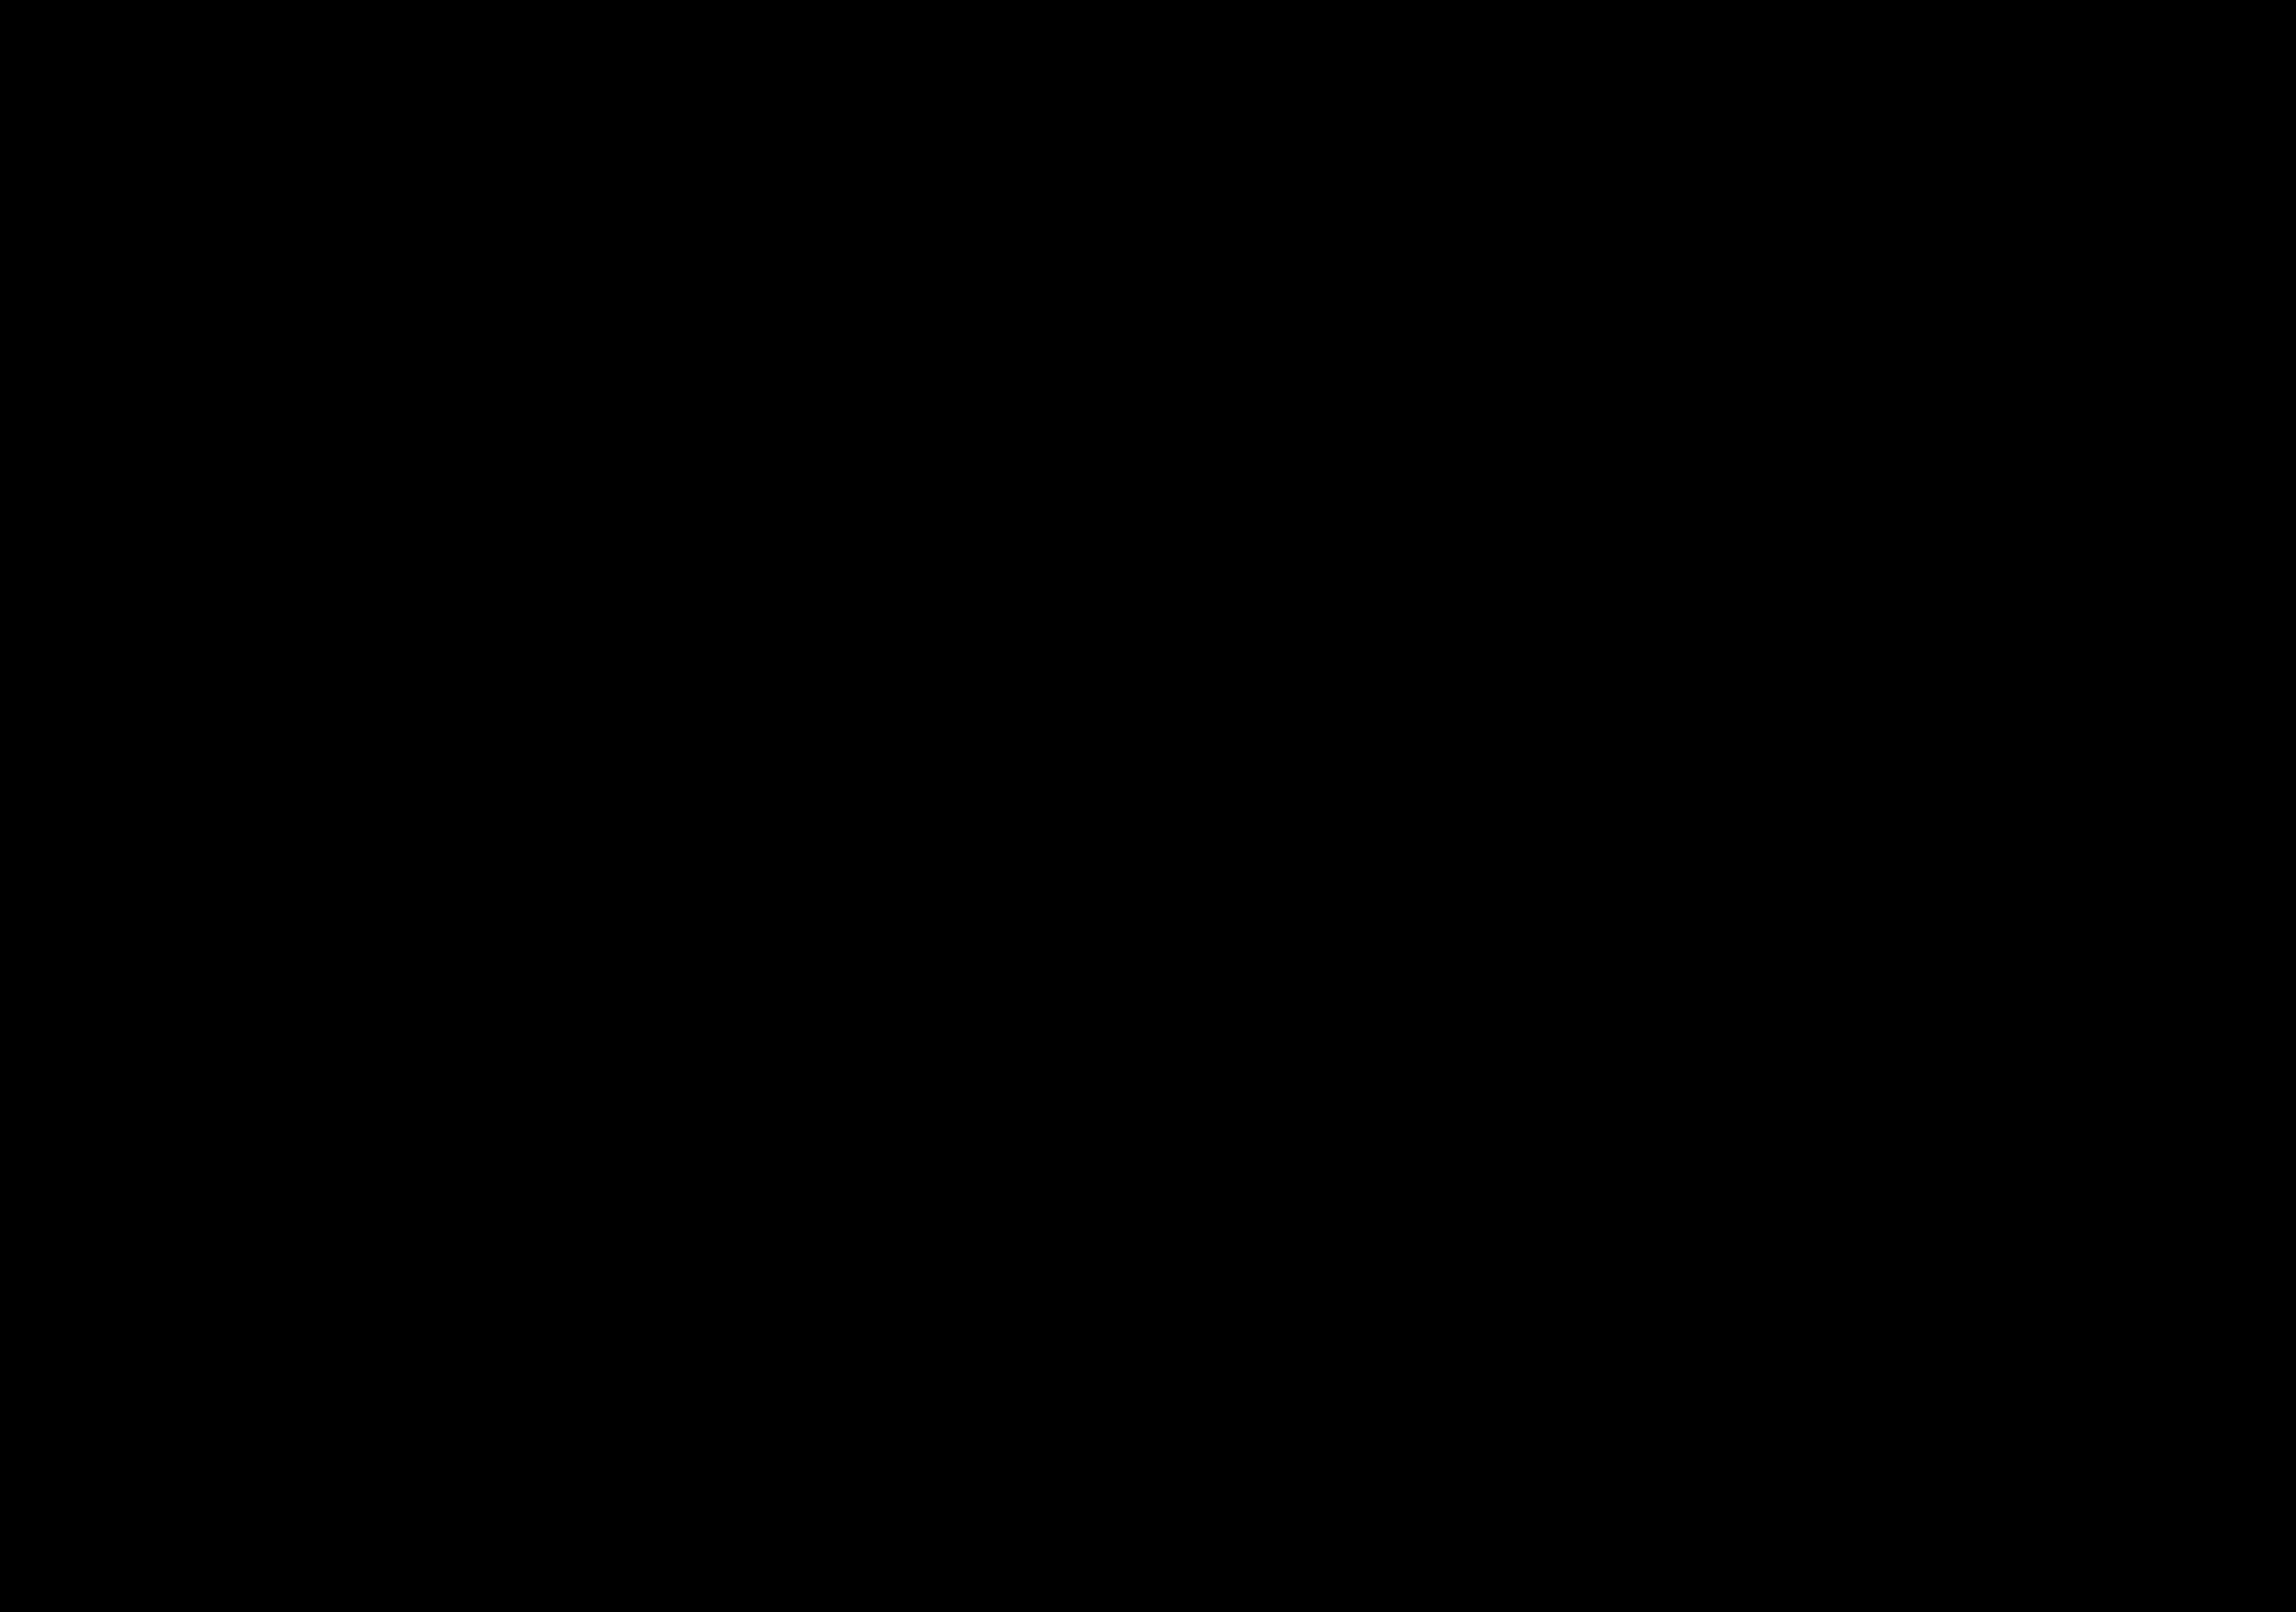 Maquinaria Guitarra Eléctrica Tulipán / Cromada / J-04 CR/3+3